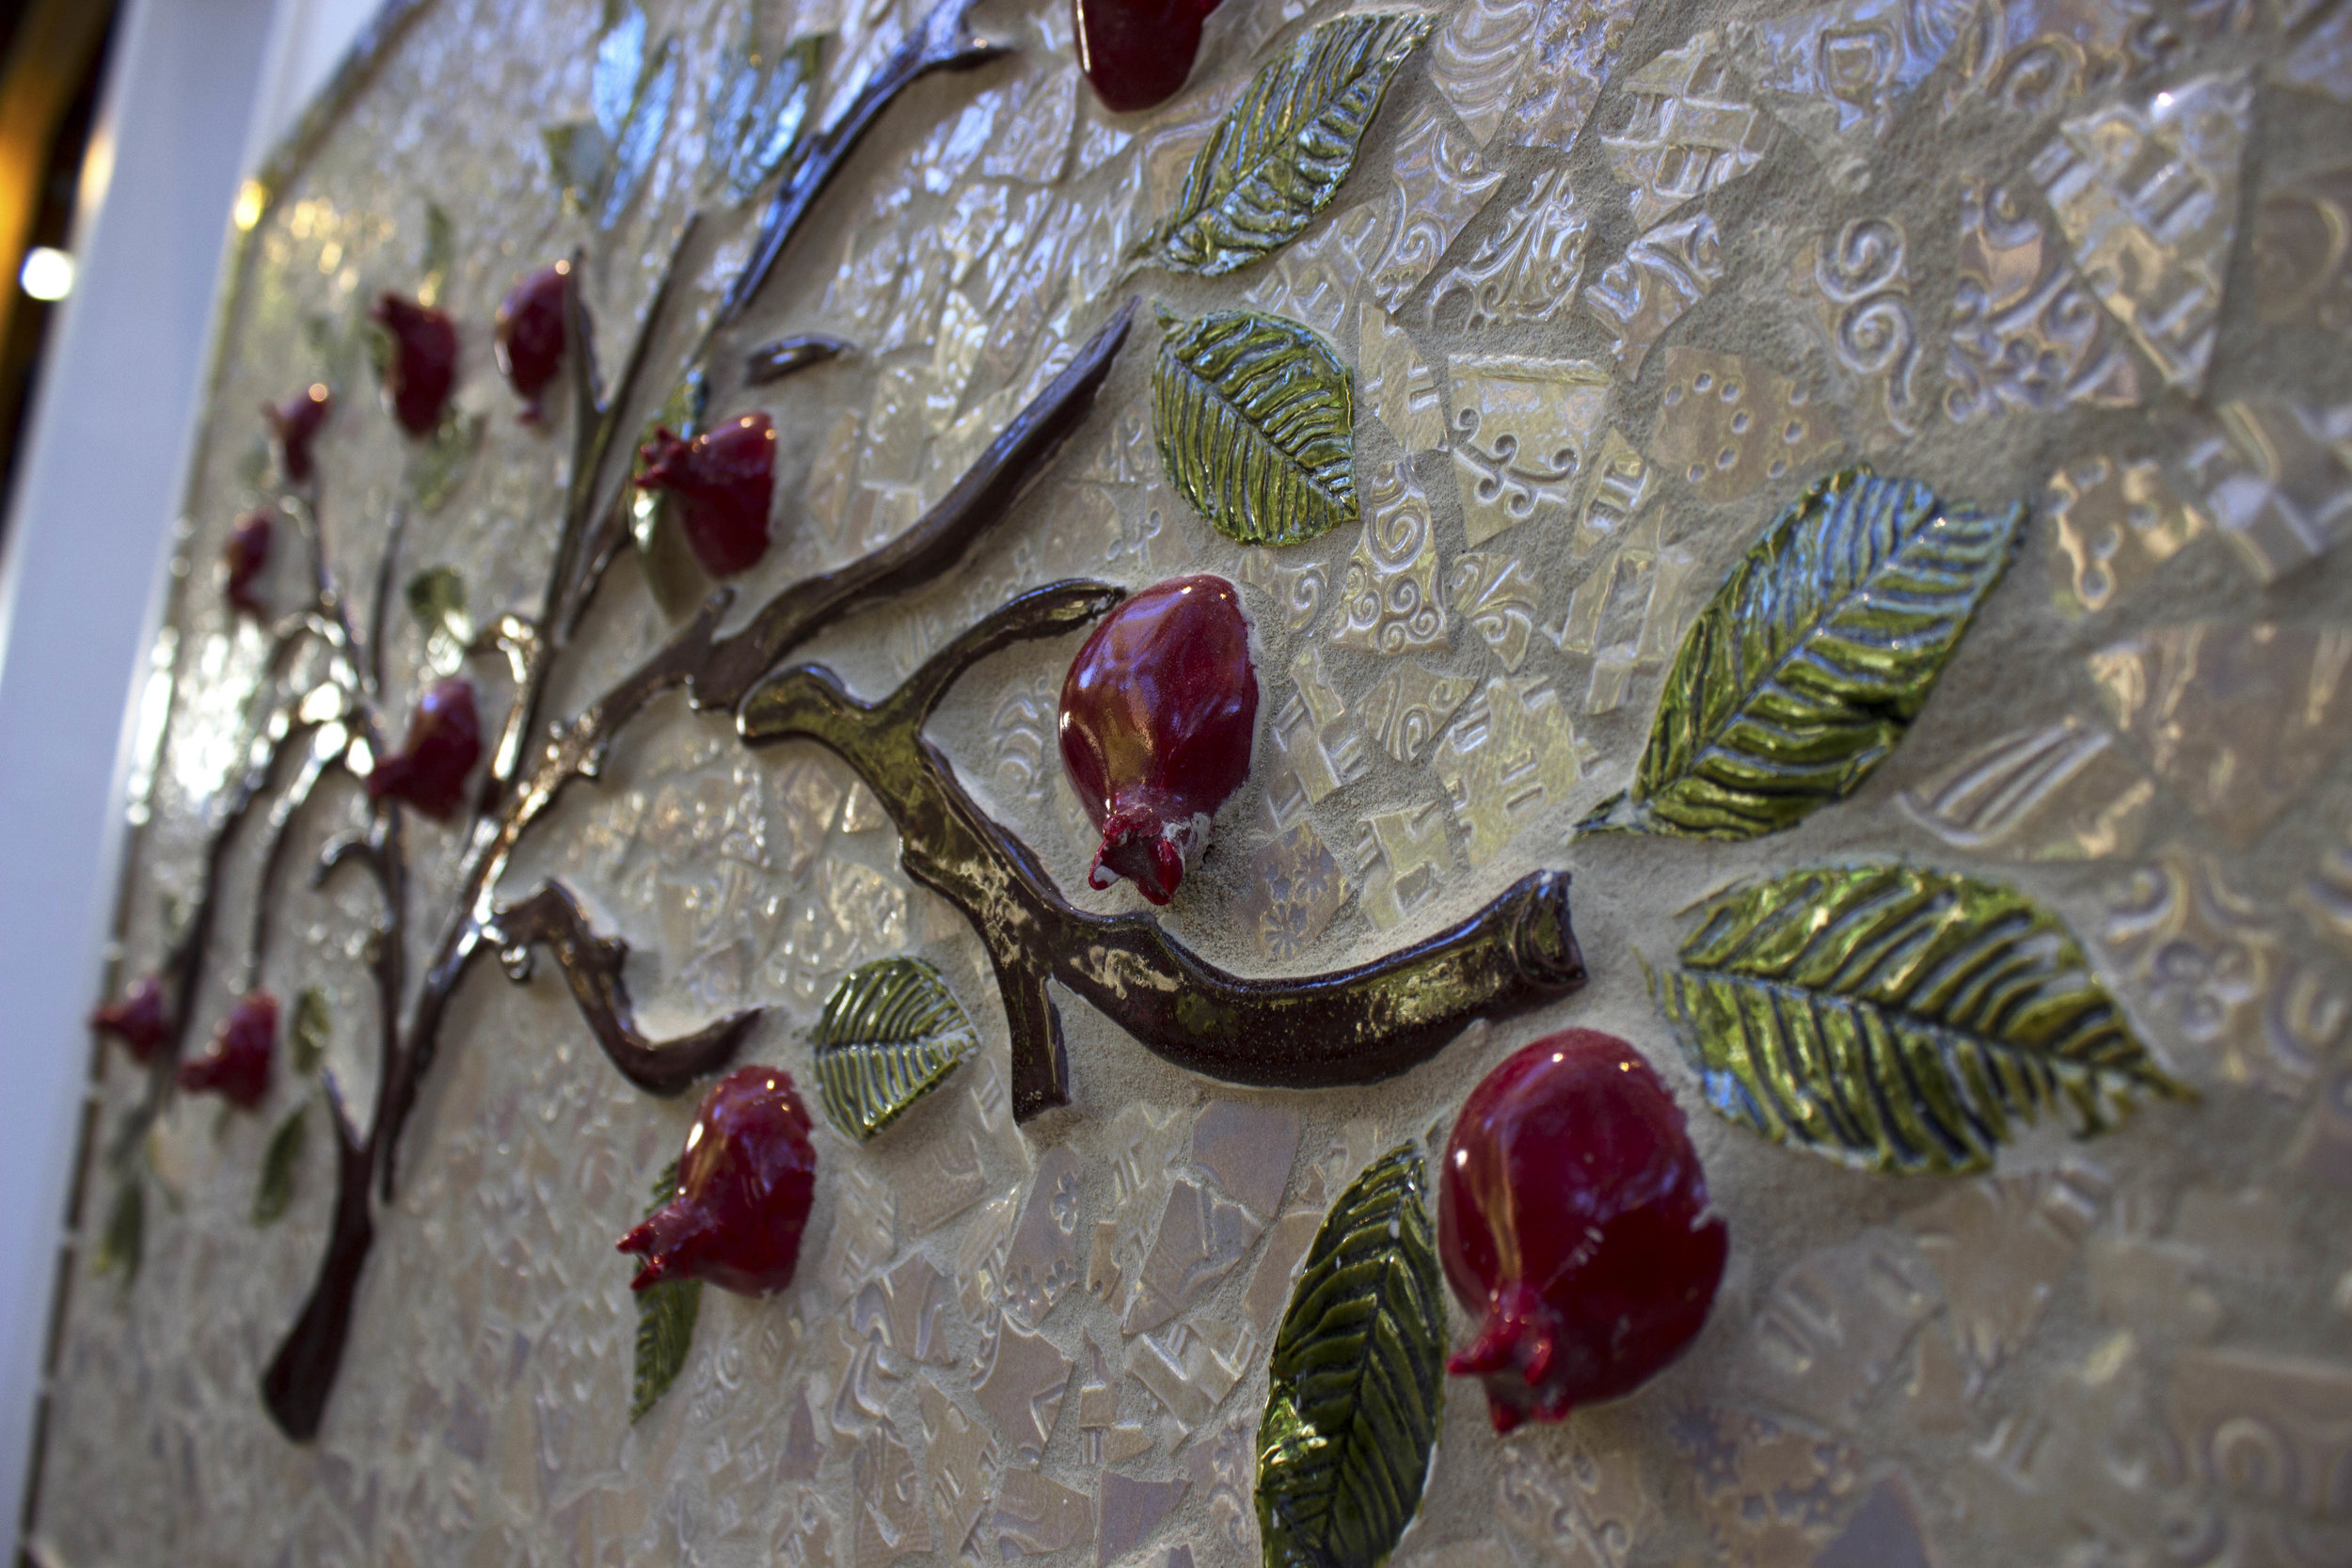 palmigranite close up_4352.jpg